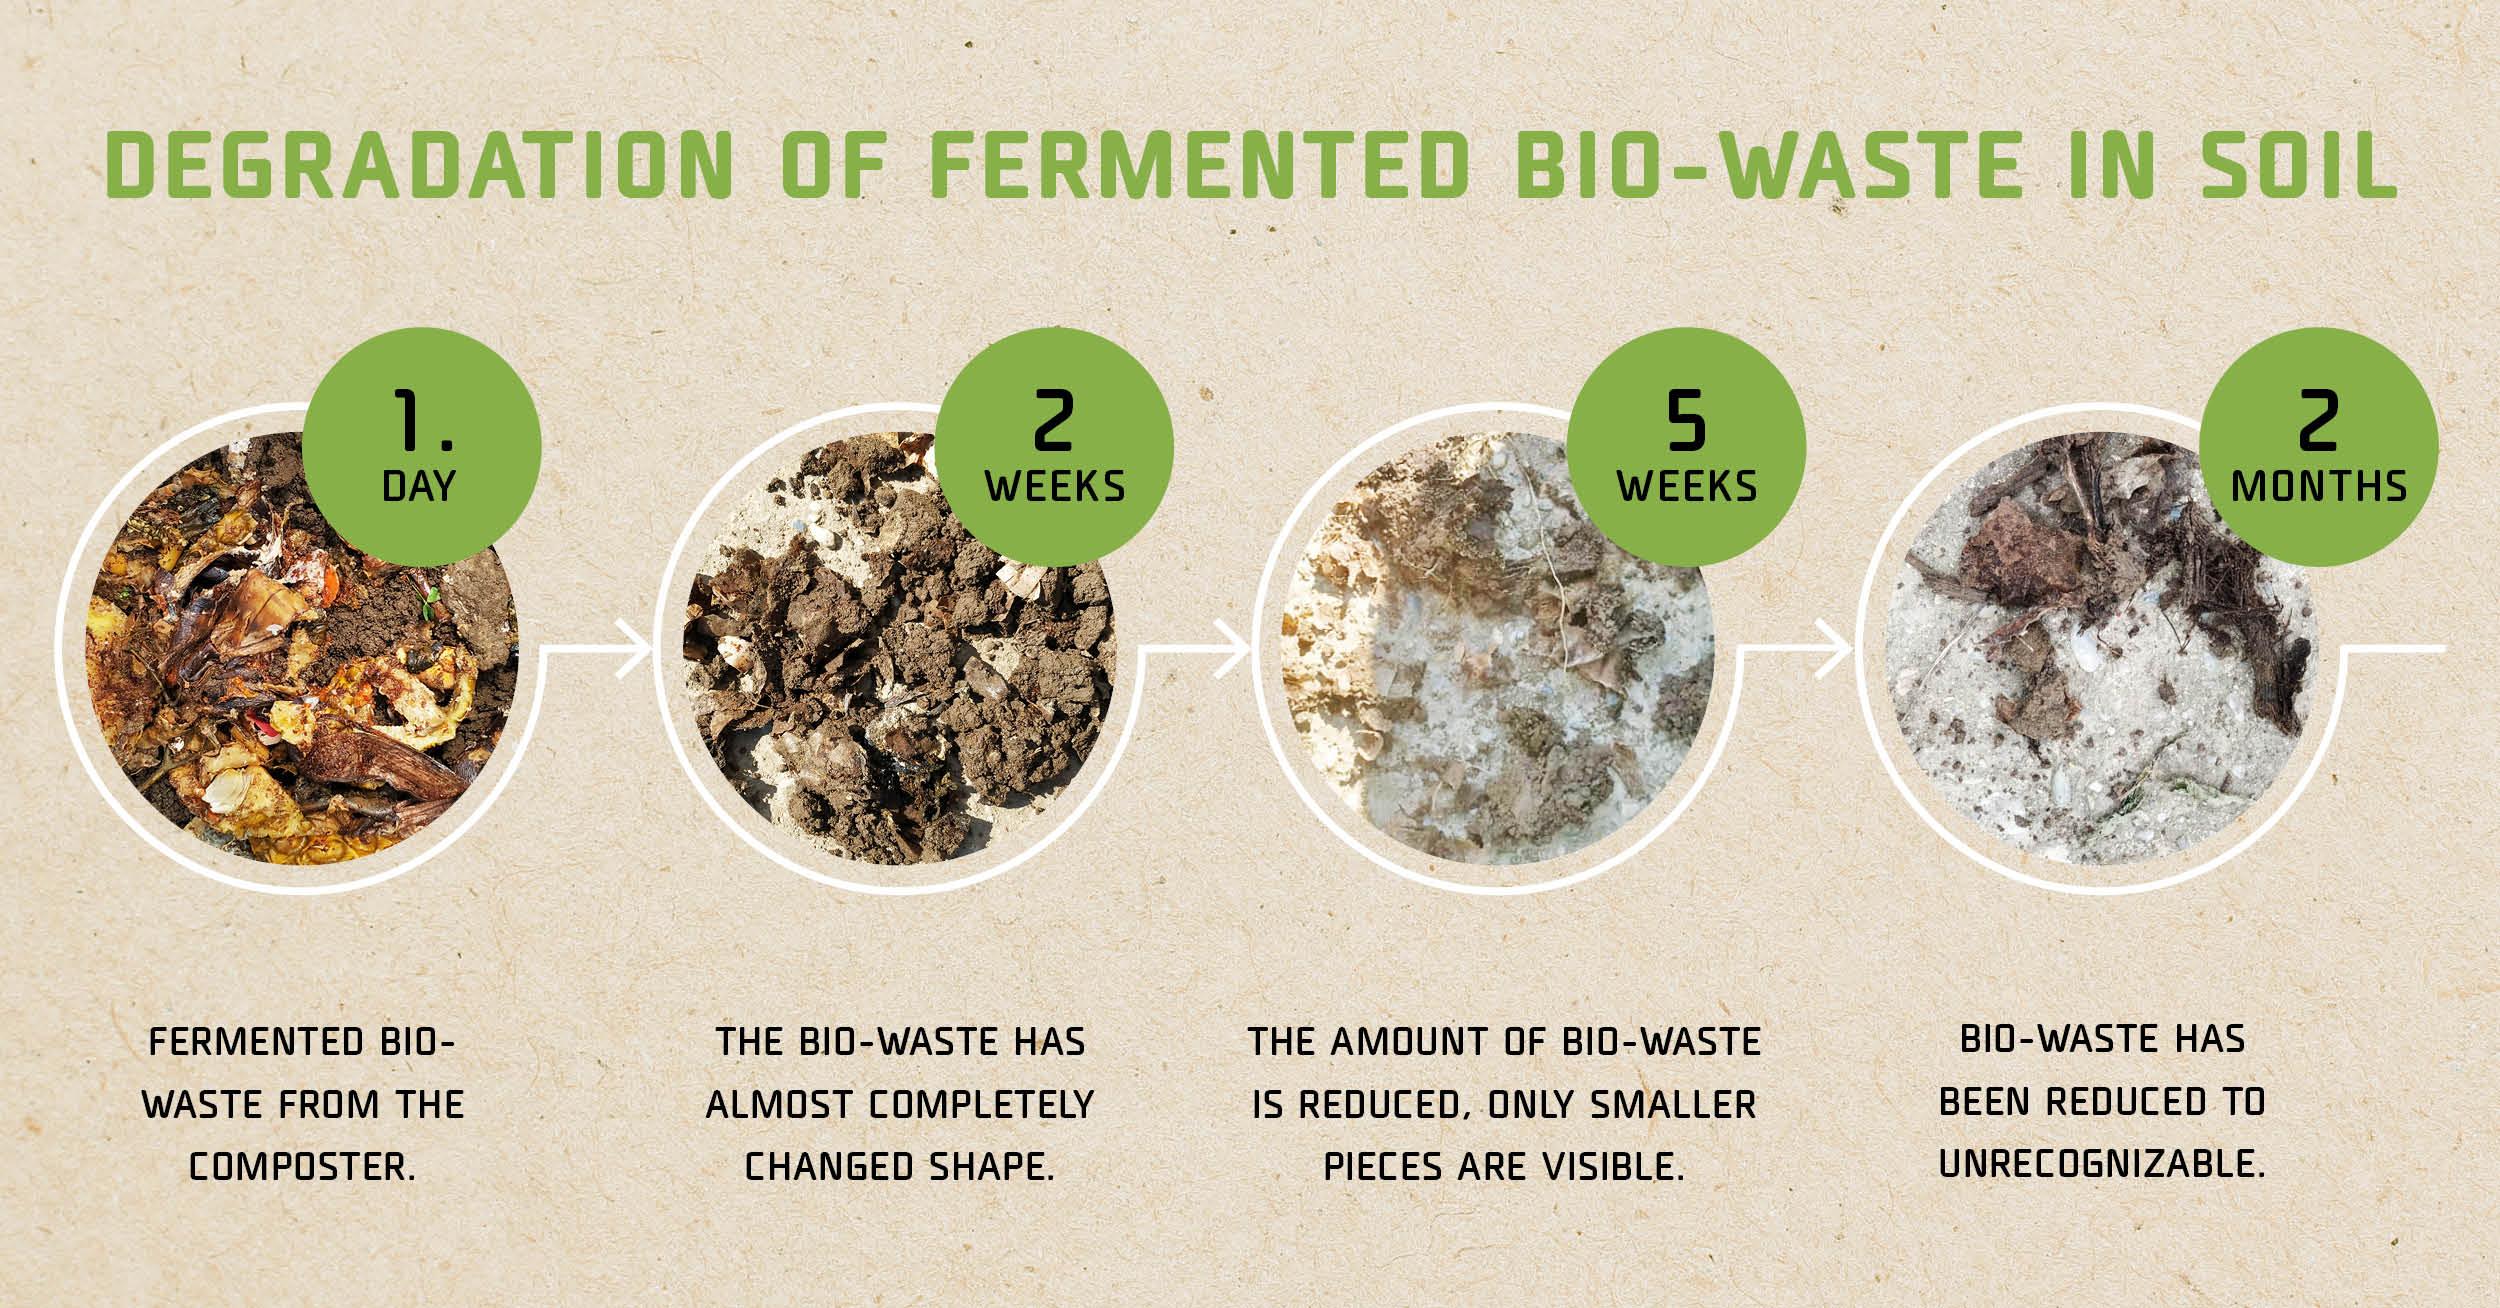 Degradation of fermented bio-waste in soil